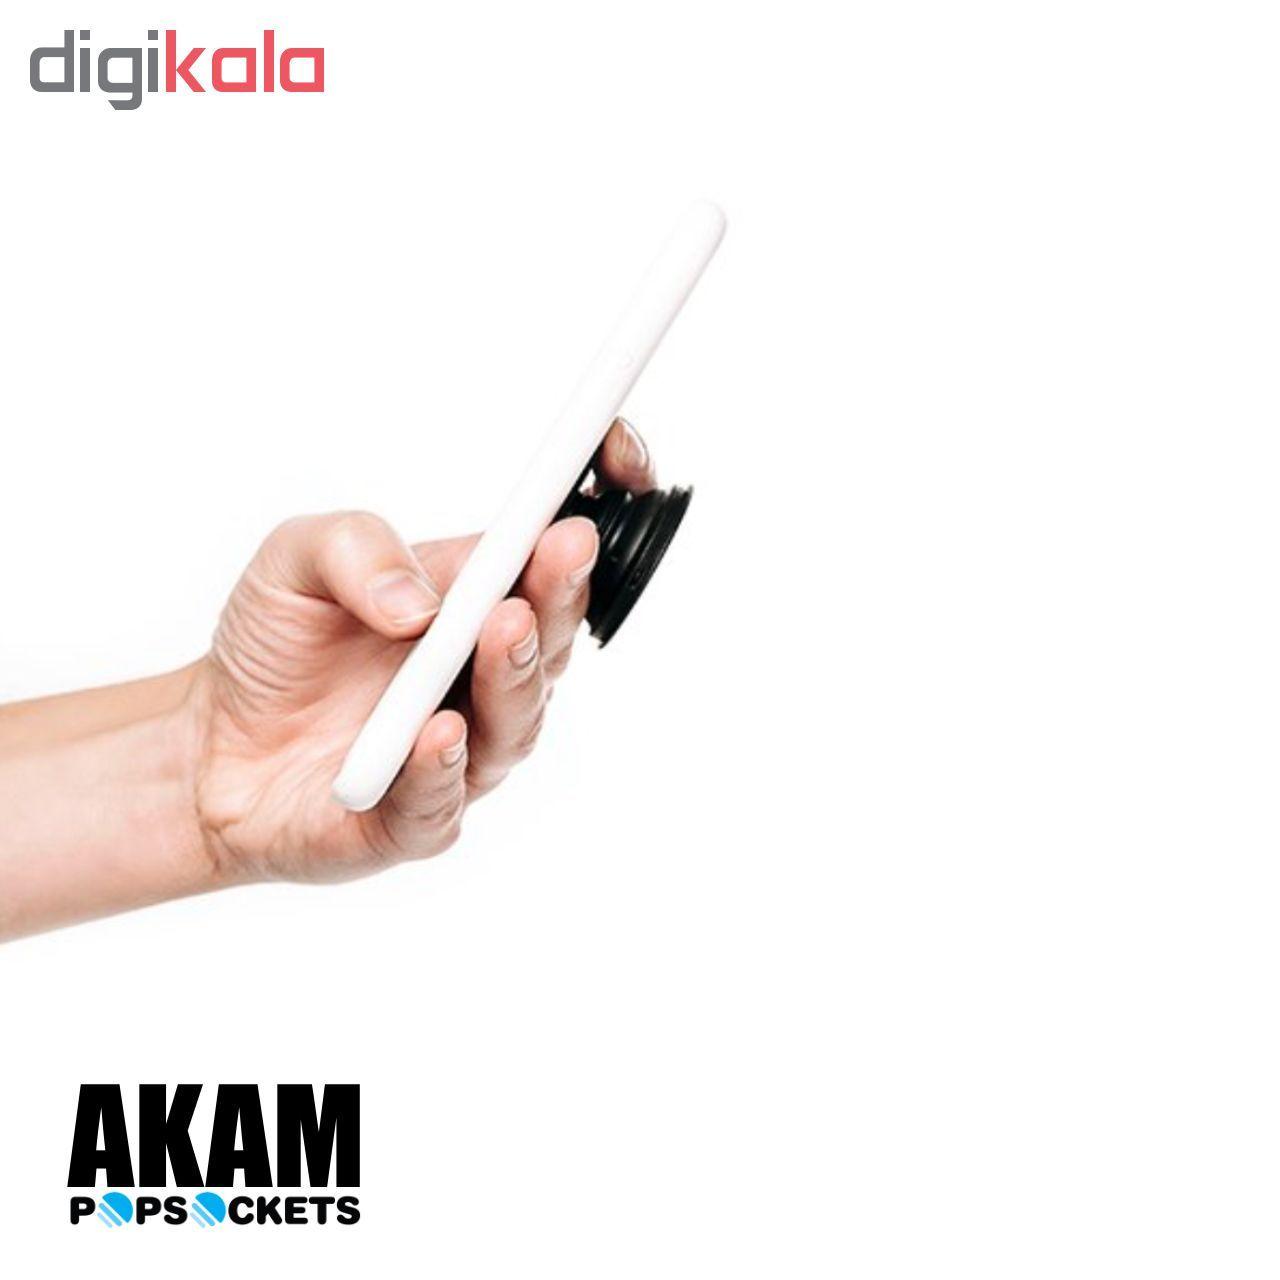 پایه نگهدارنده گوشی موبایل پاپ سوکت آکام مدل APS0191 main 1 8